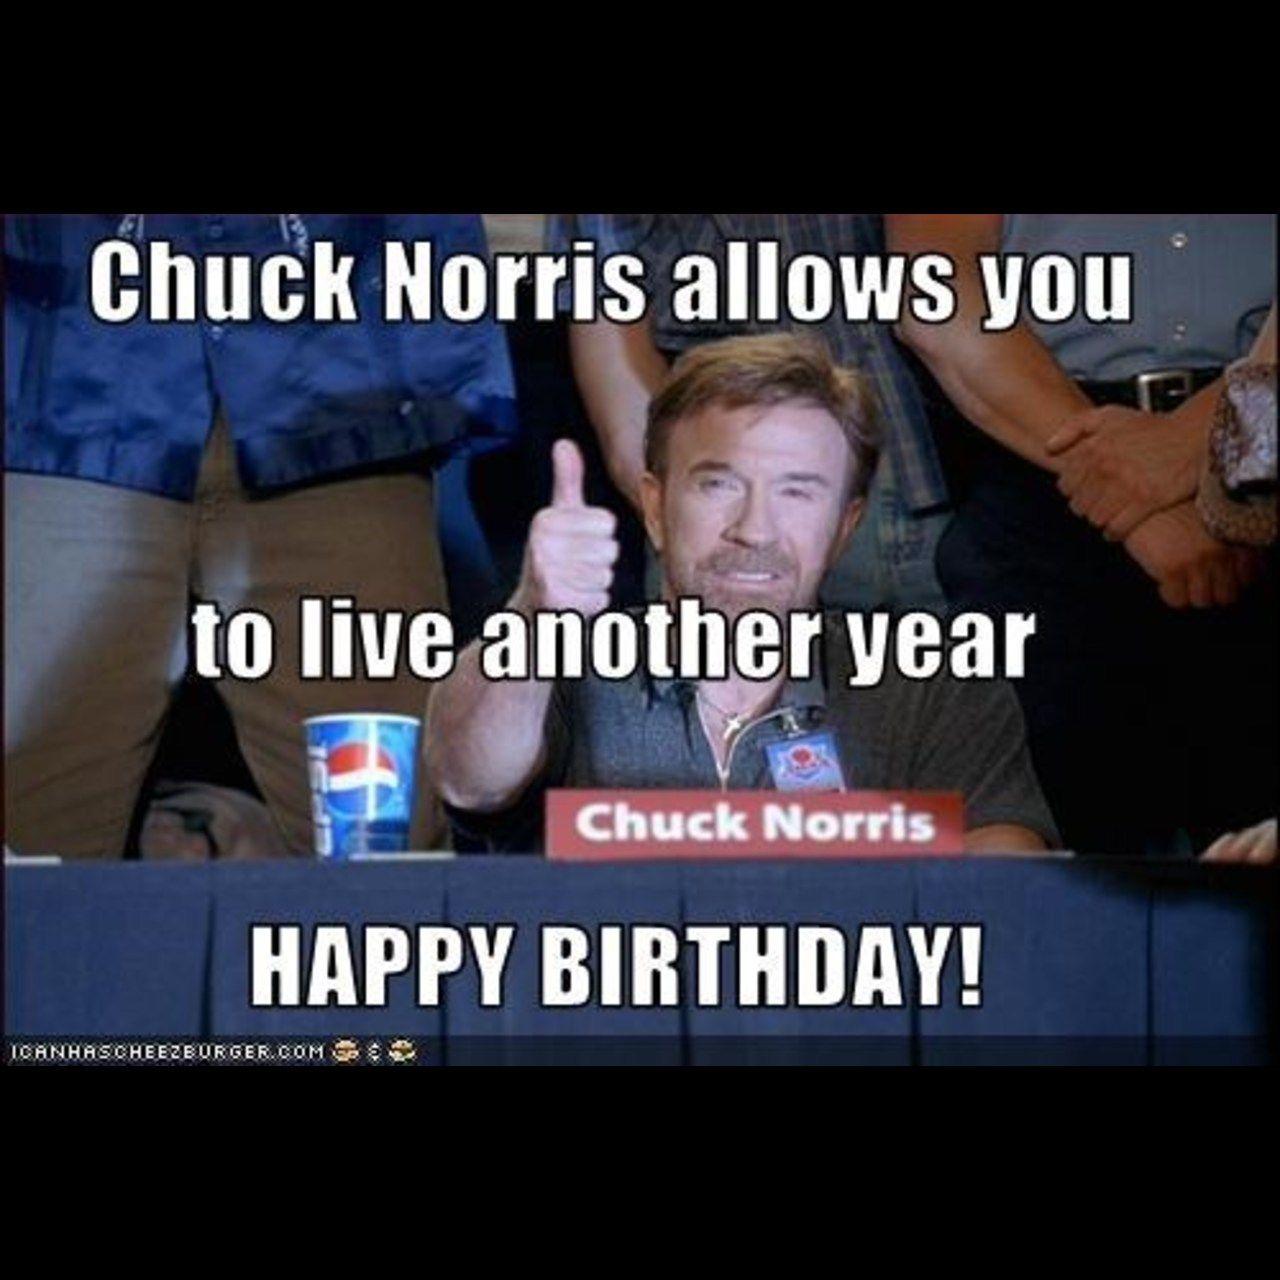 Chuck Norris Happy Birthday More Chuck Norris Funny Stuff - 22 ridiculous chuck norris memes